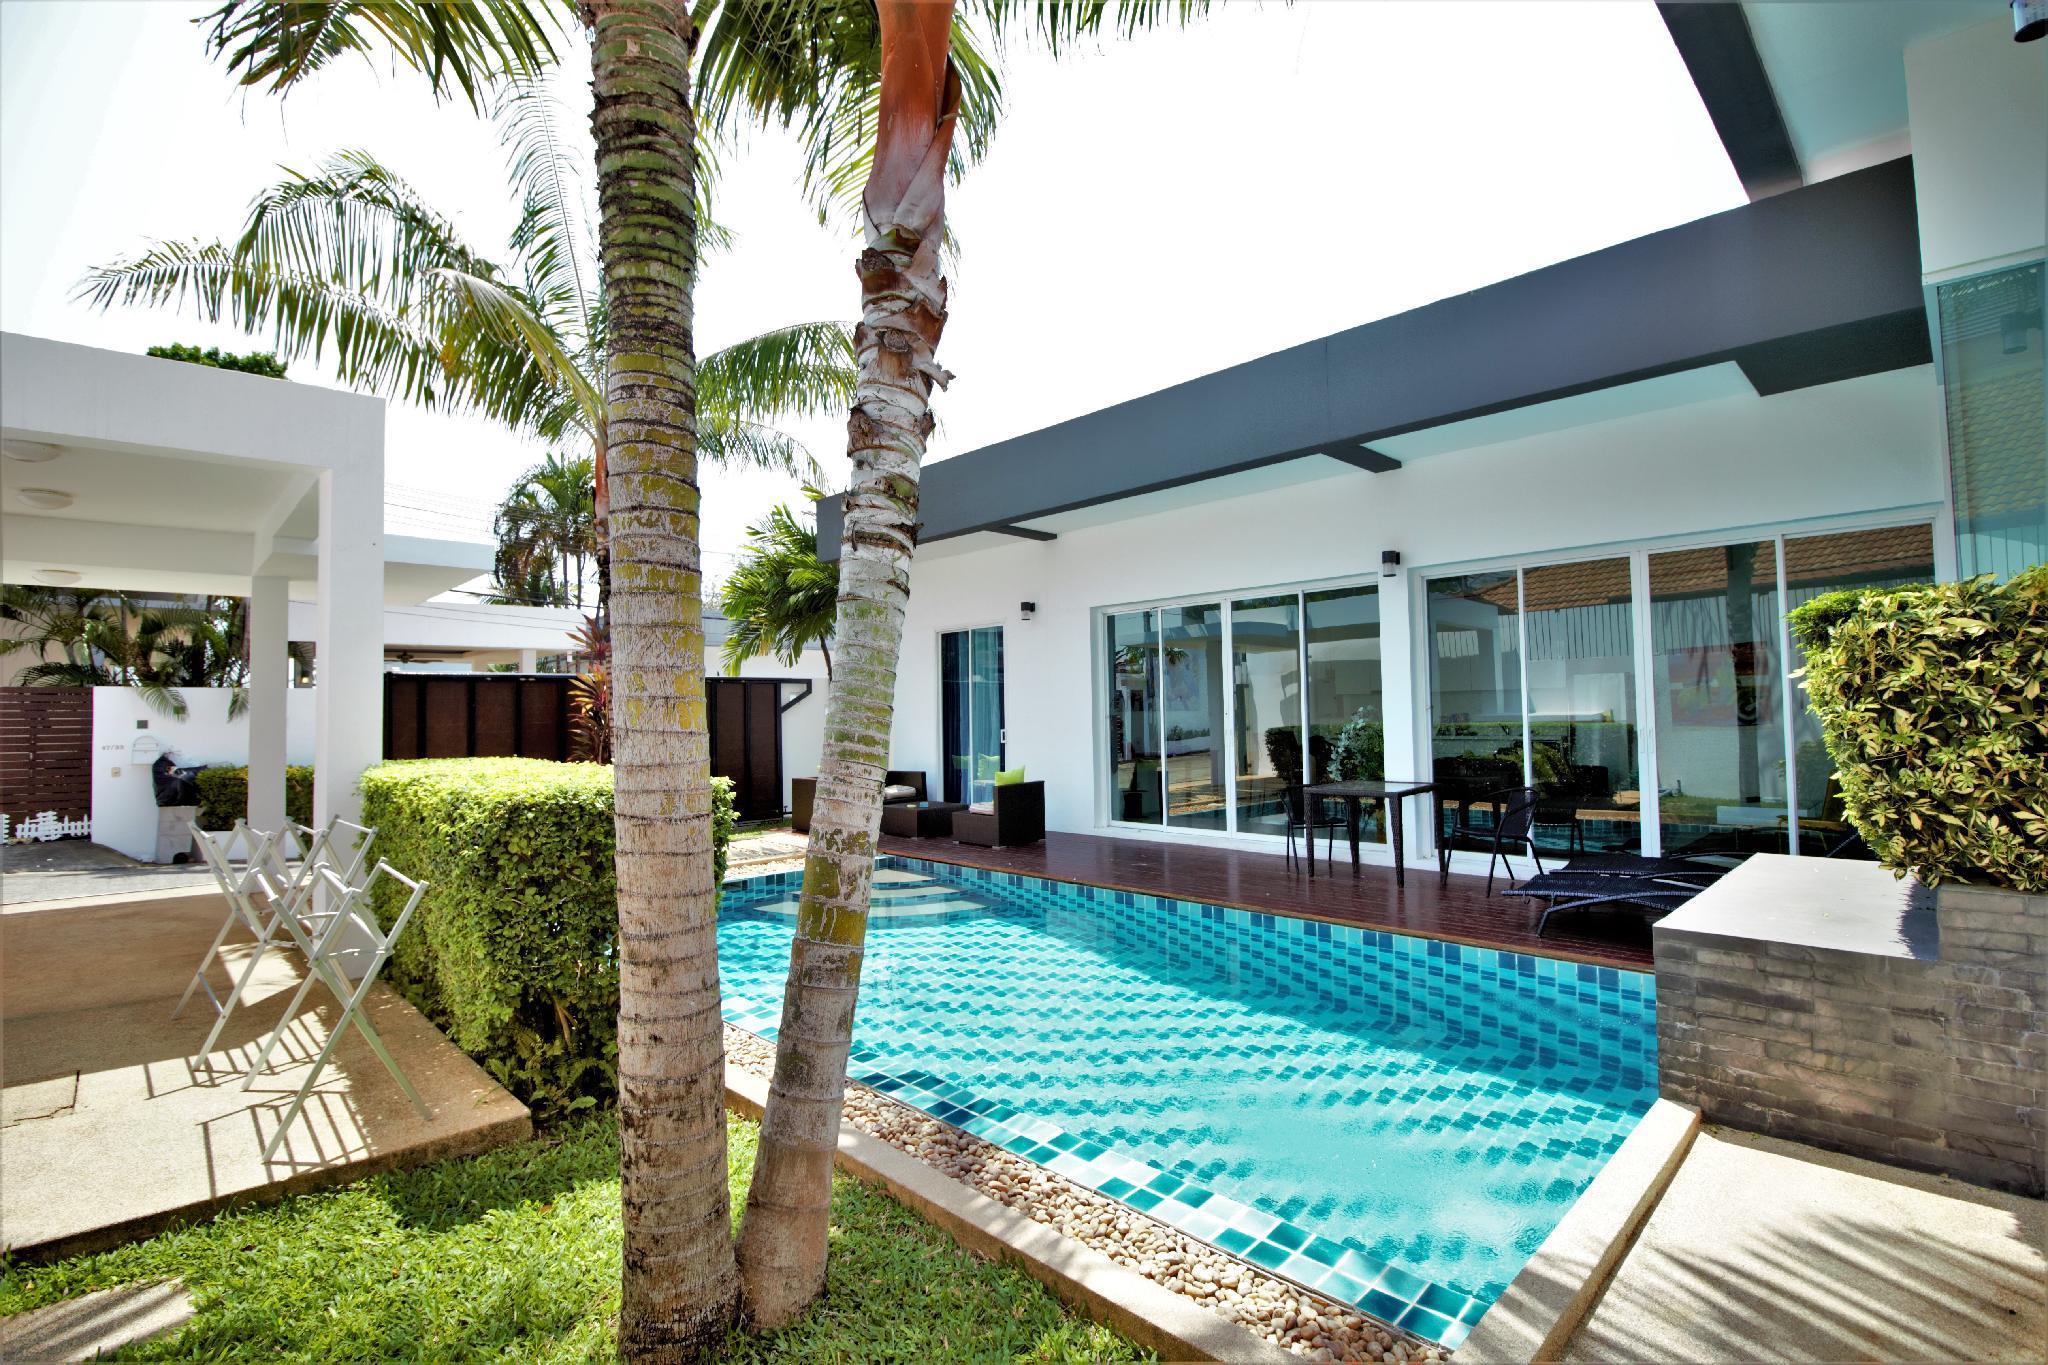 Villa Paradise by PHR วิลลา 3 ห้องนอน 2 ห้องน้ำส่วนตัว ขนาด 350 ตร.ม. – หาดราไวย์